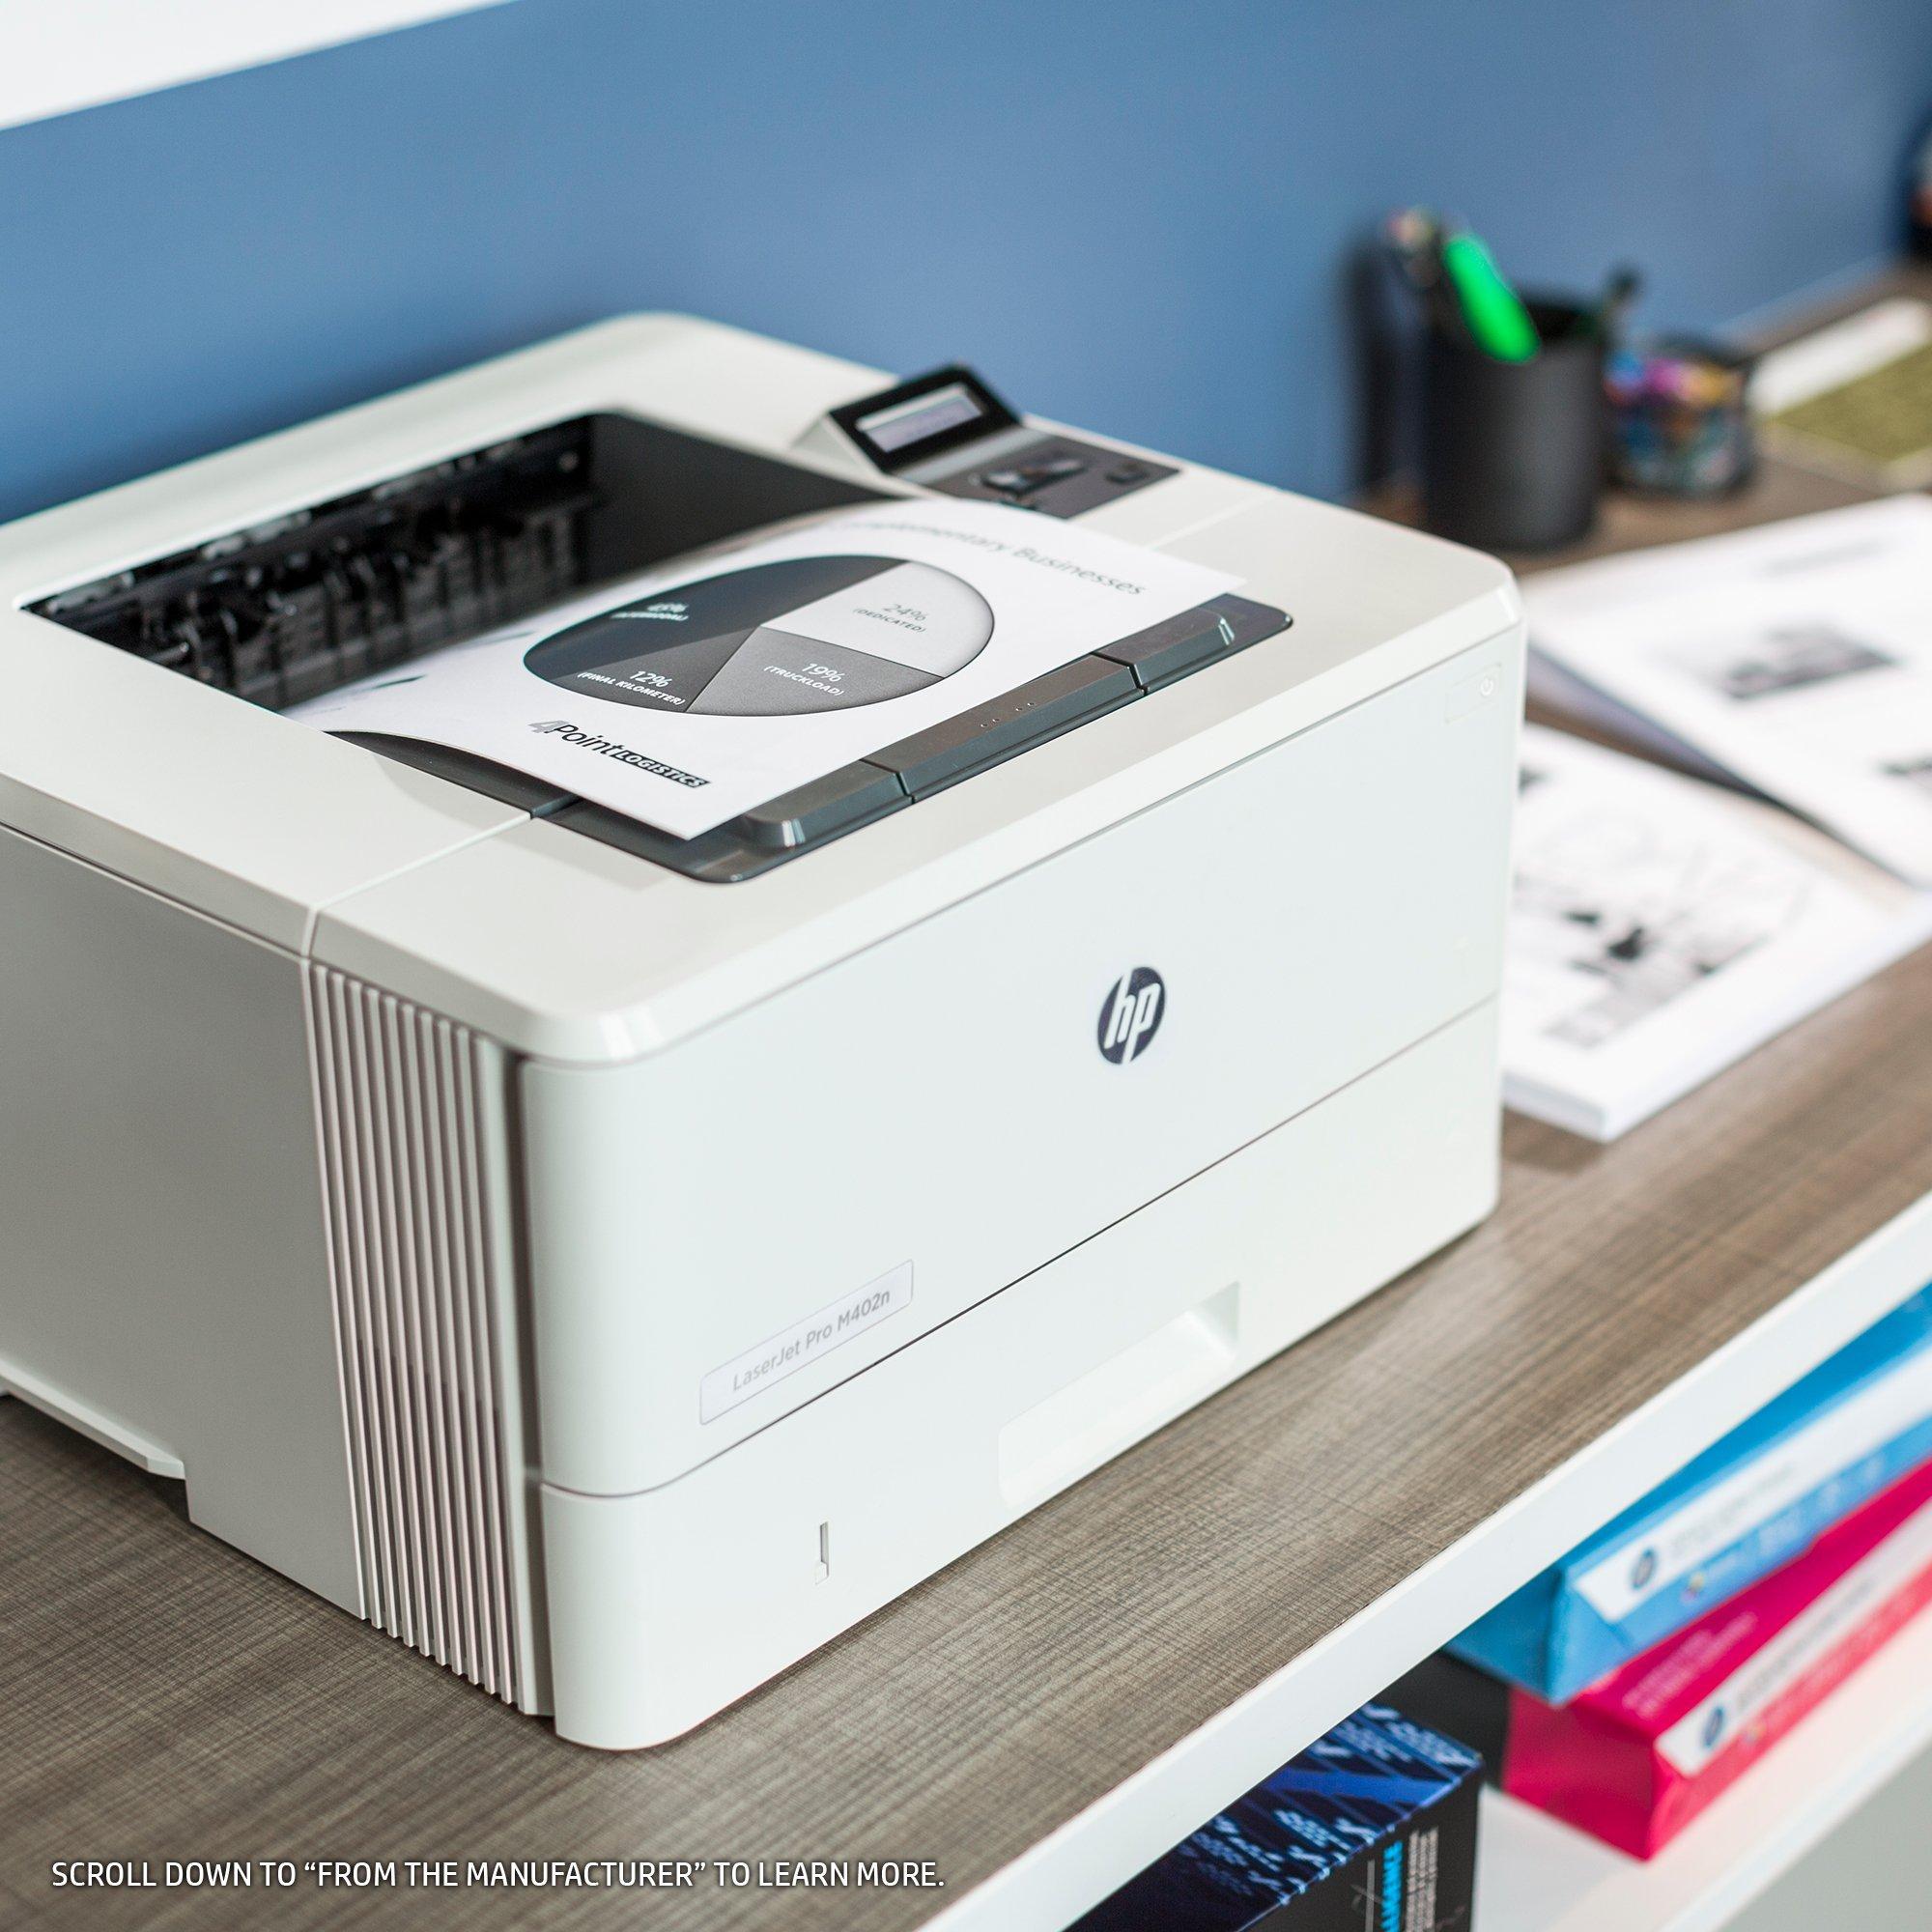 HP Laserjet Pro M402n Monochrome Printer, (C5F93A) (Renewed) by HP (Image #4)